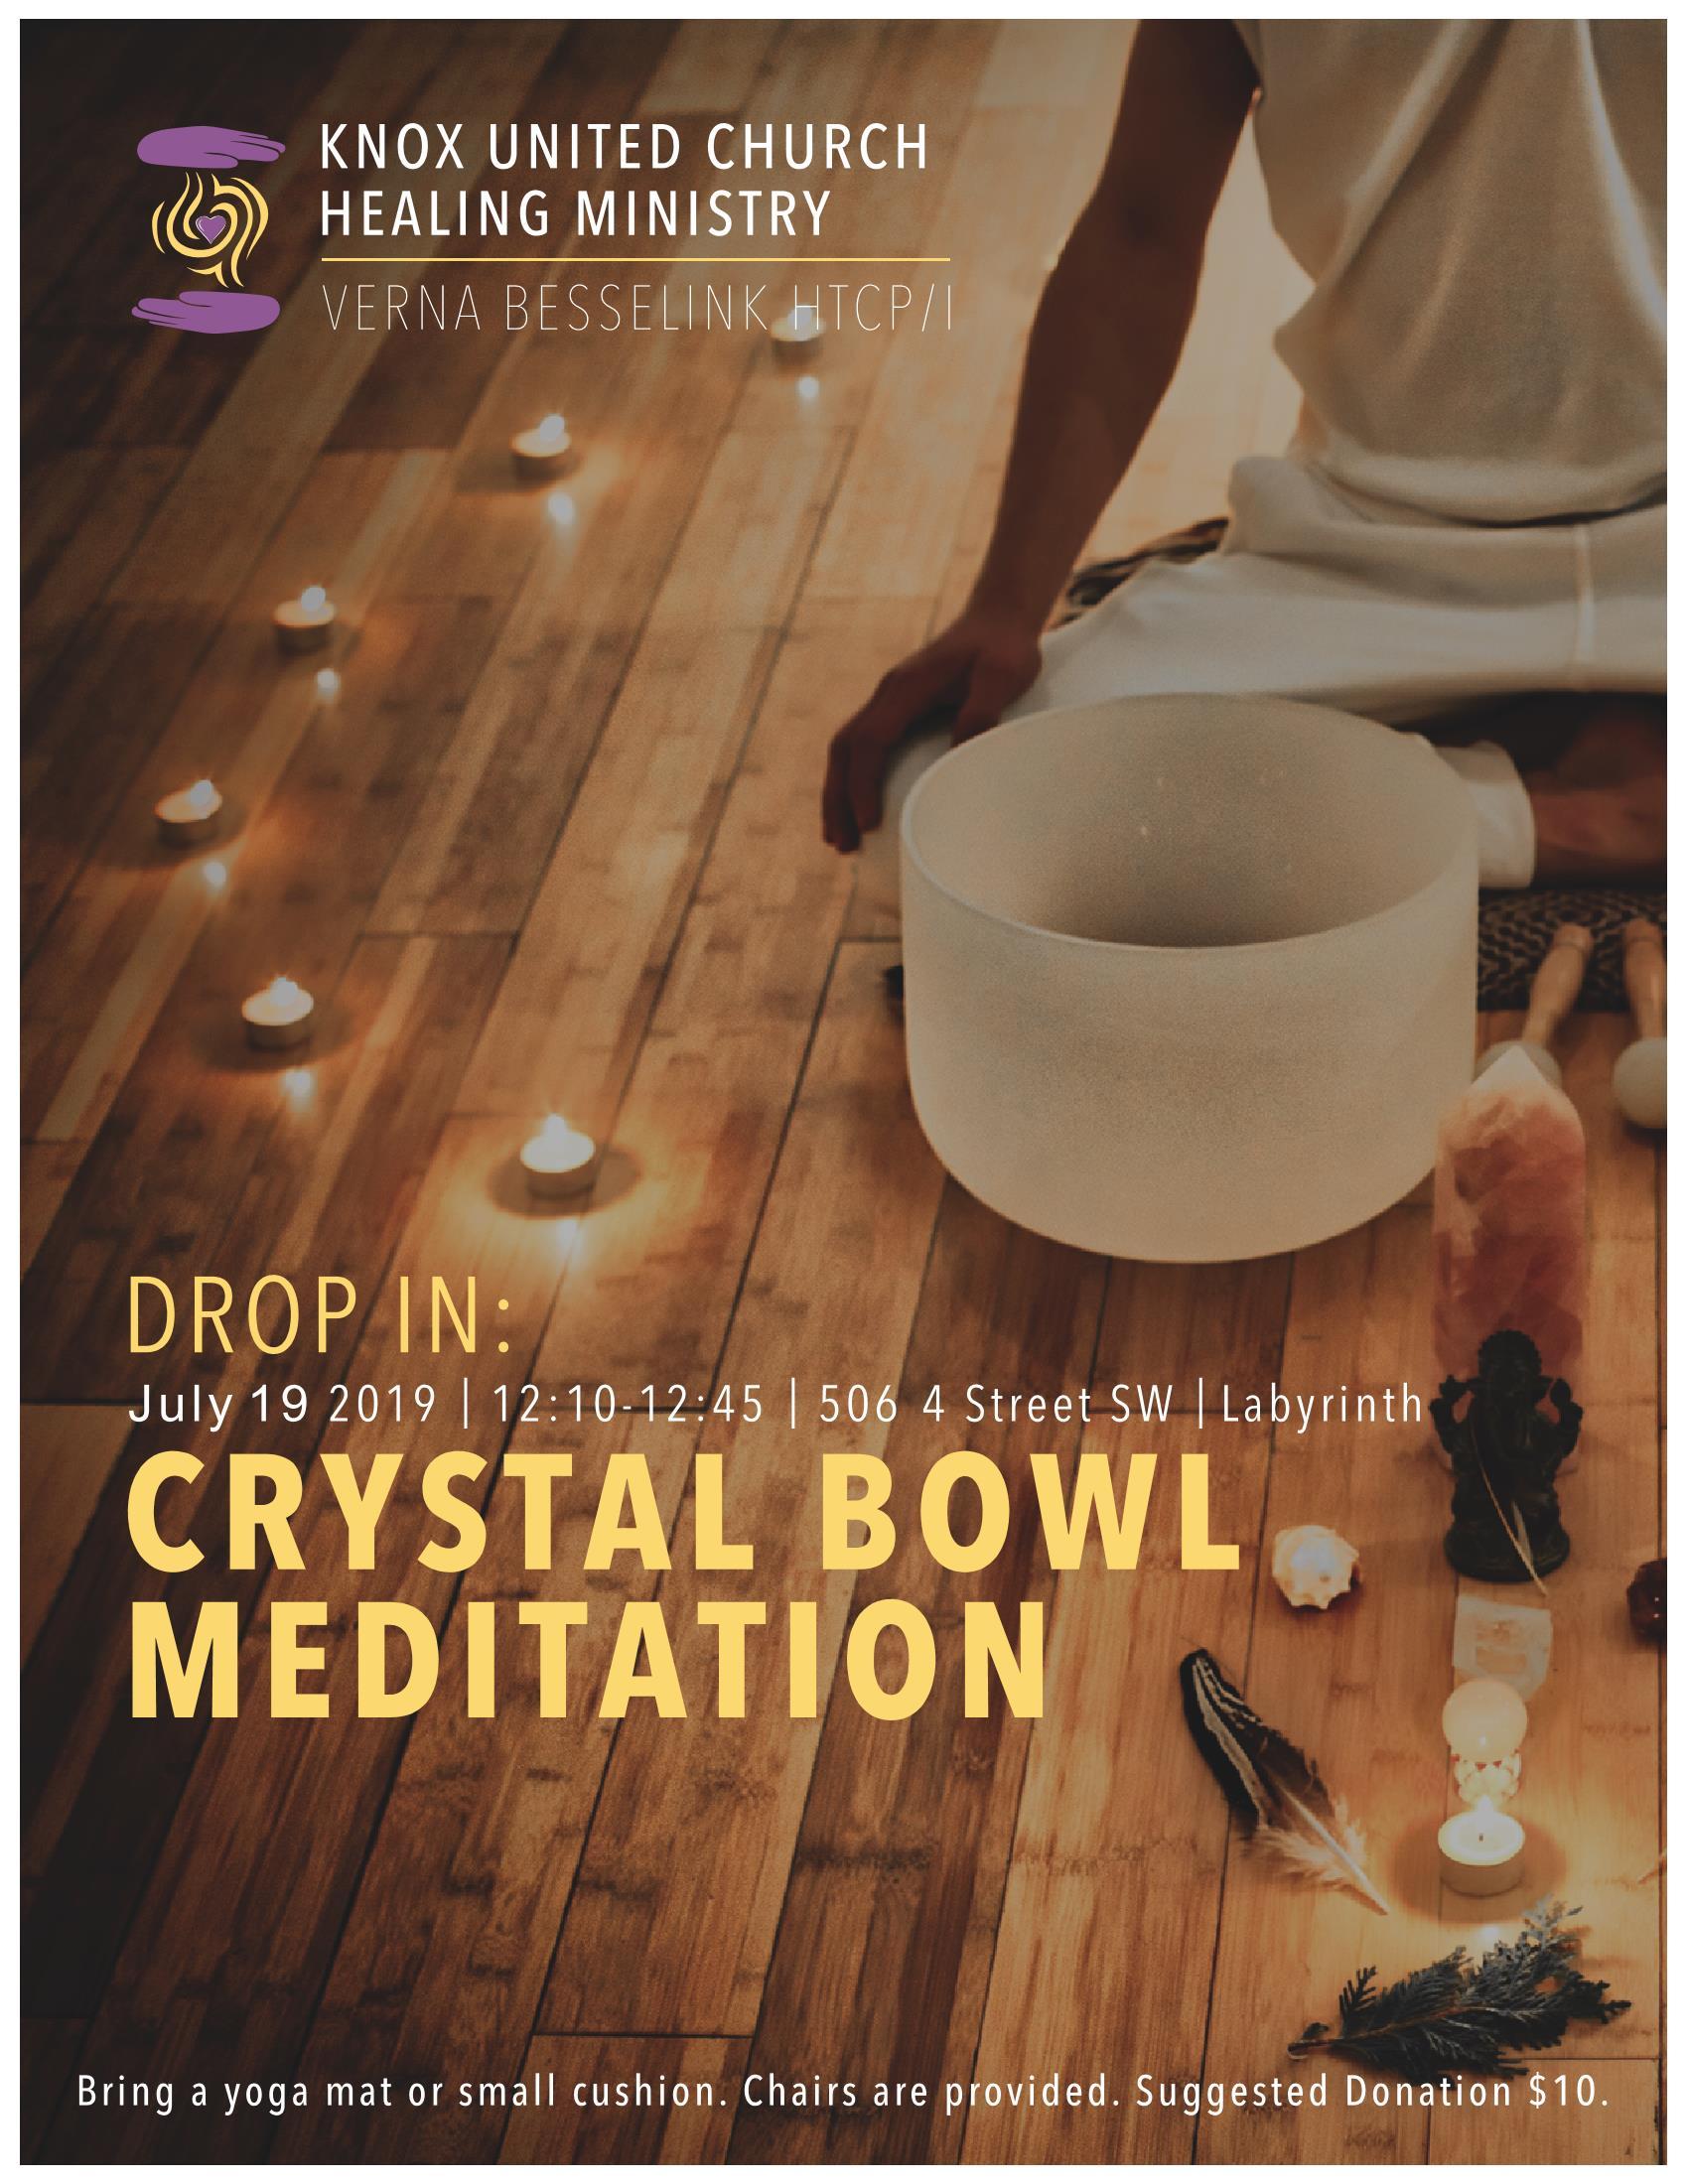 2019-07-19-kuc-meditation.jpg